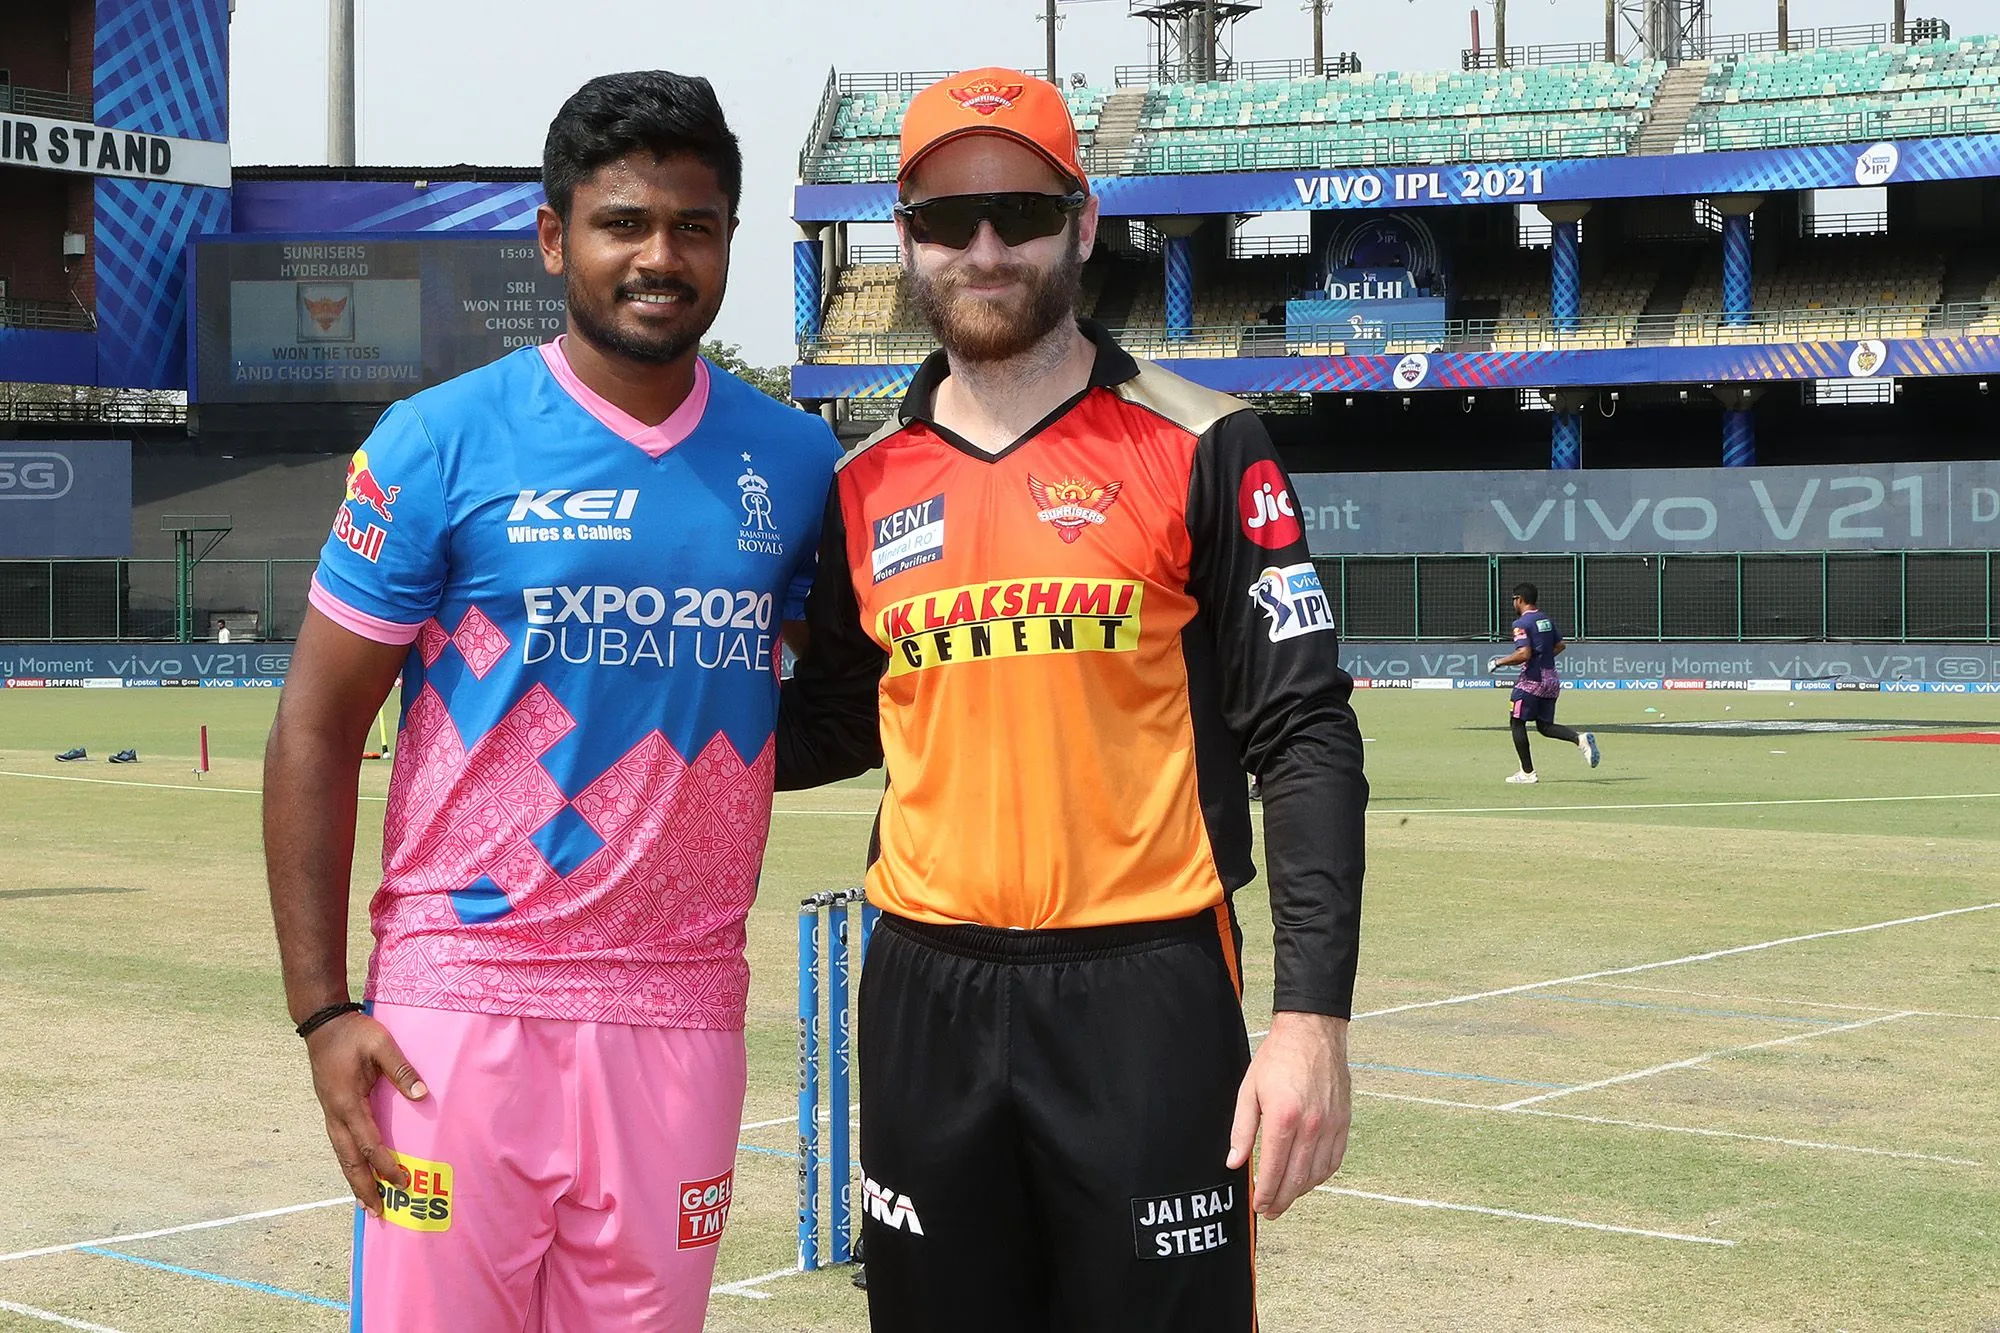 RR had beaten SRH in their previous IPL 2021 encounter   BCCI-IPL